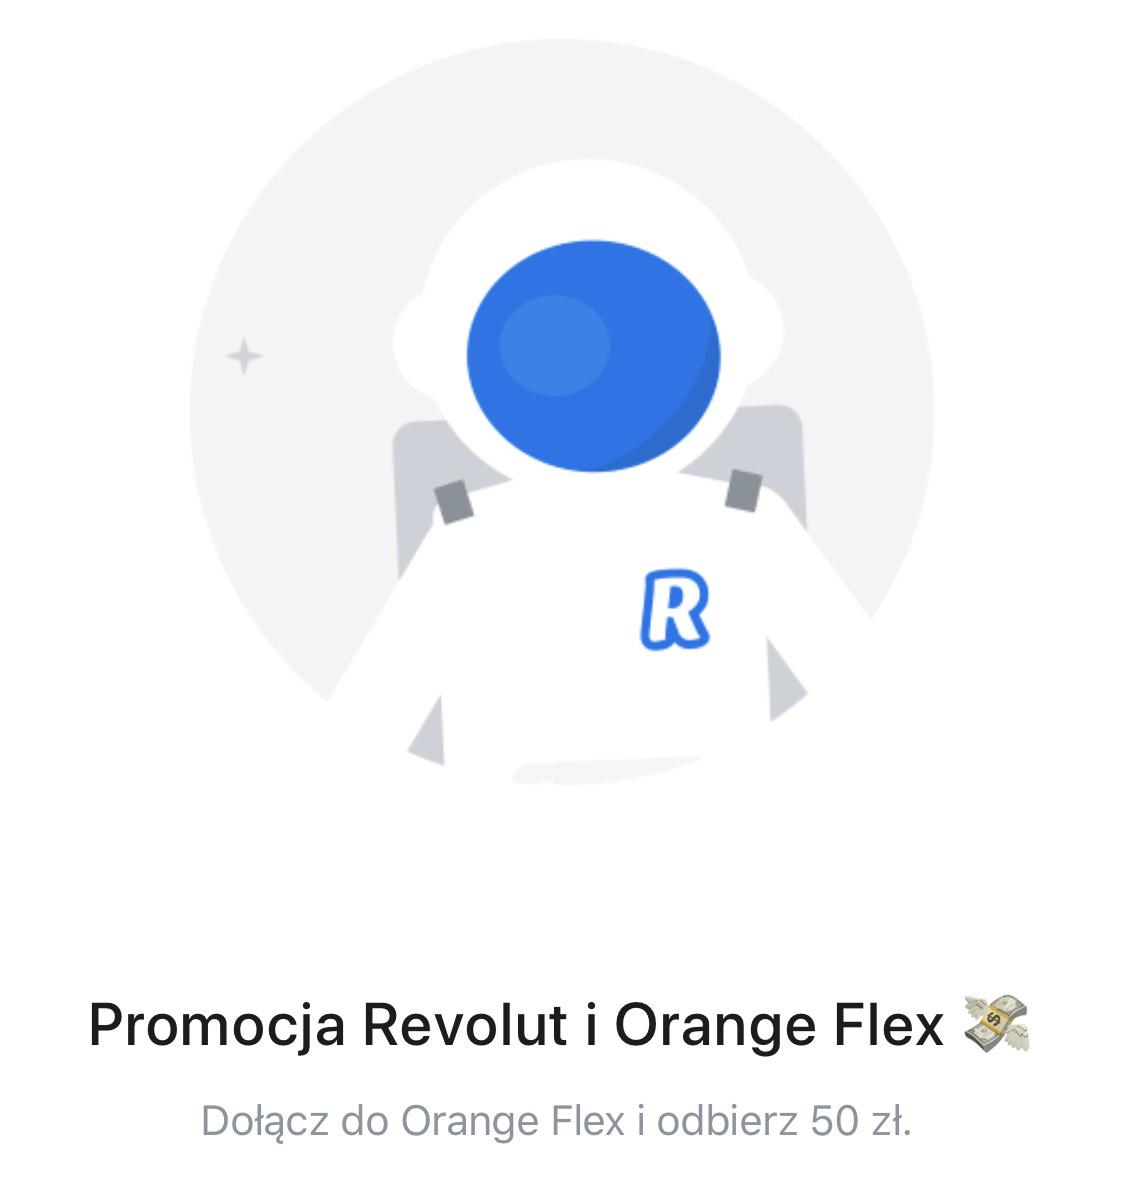 Promocja Revolut i Orange Flex